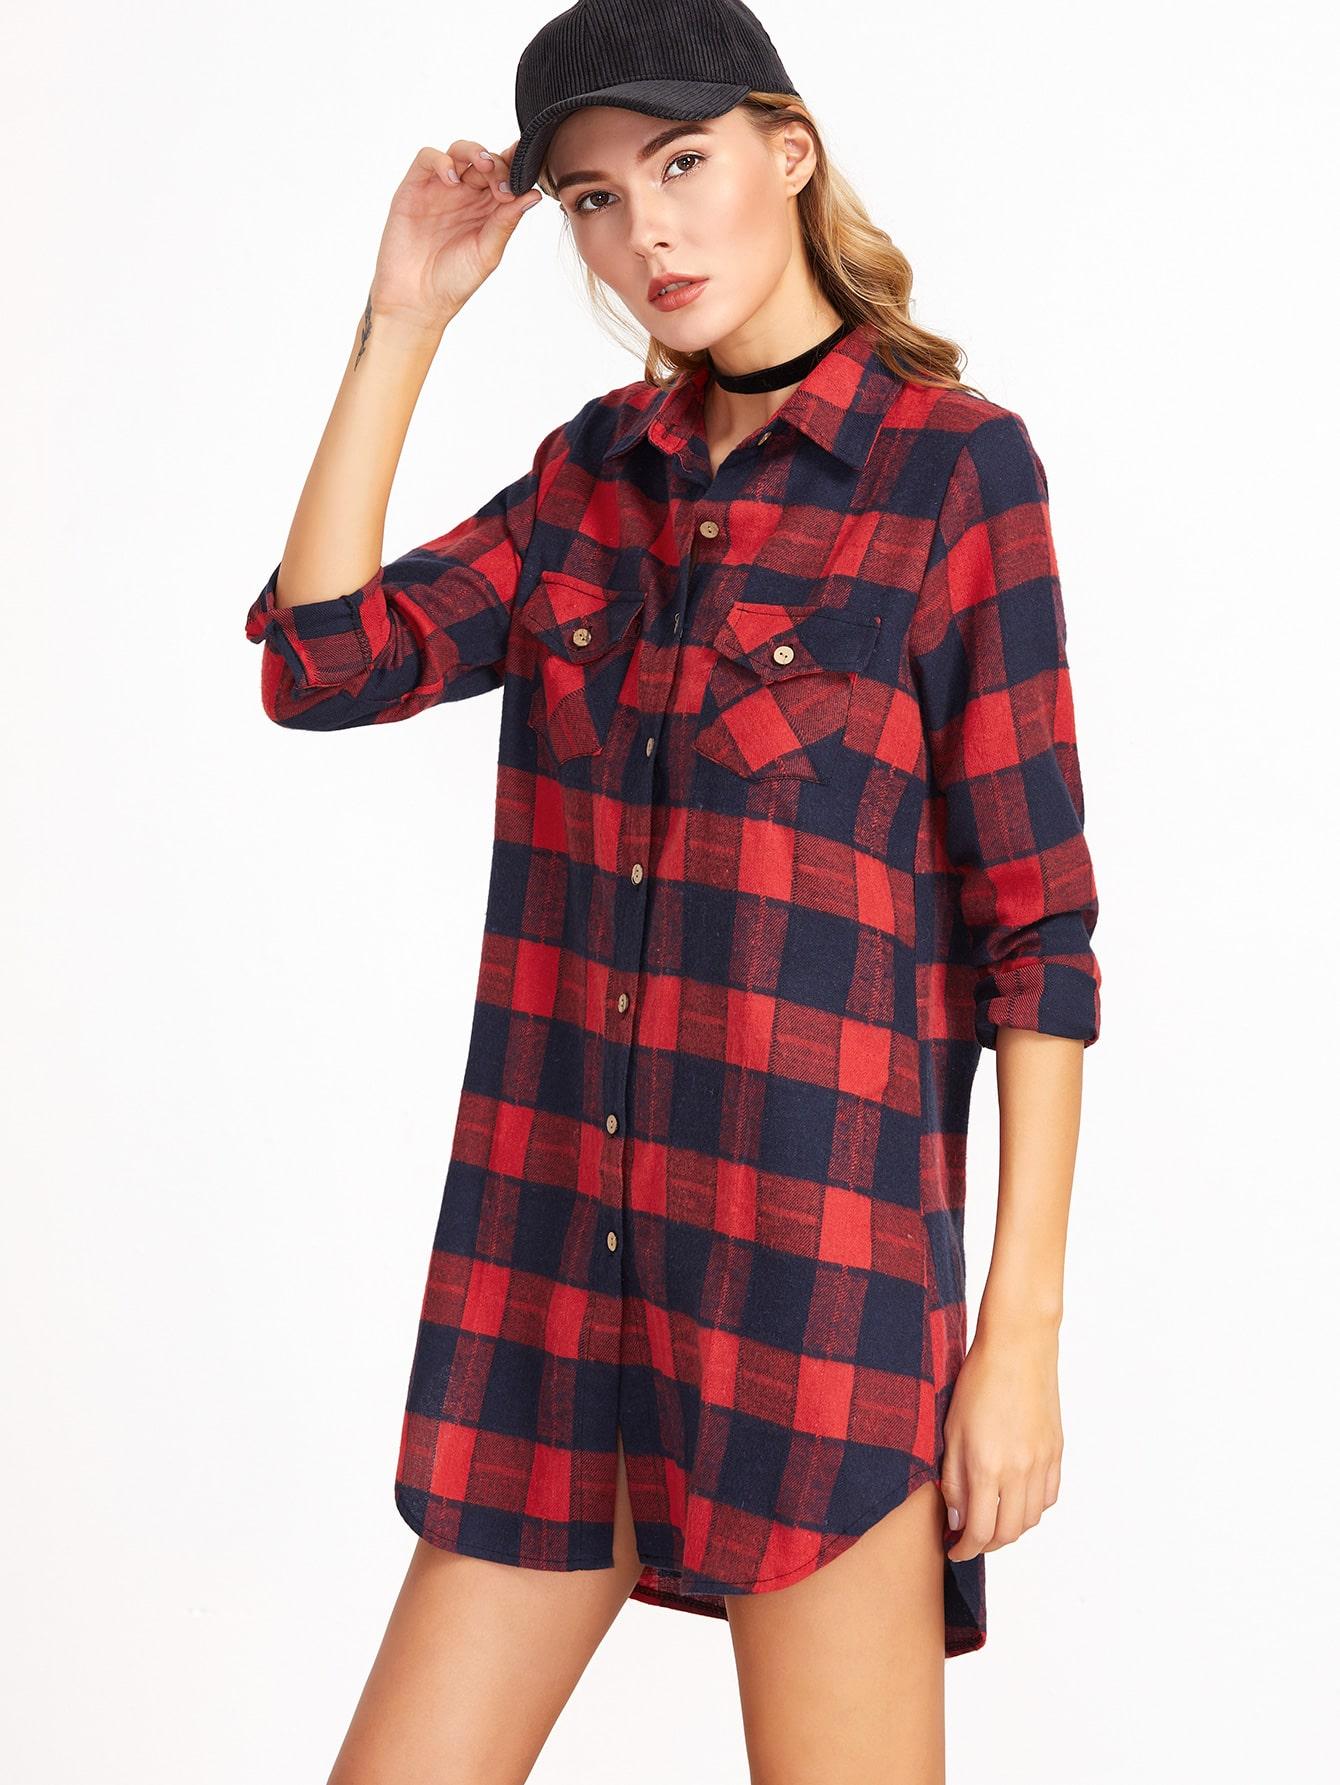 Red Plaid High Low Slit Side Pockets Shirt DressRed Plaid High Low Slit Side Pockets Shirt Dress<br><br>color: Red<br>size: XL